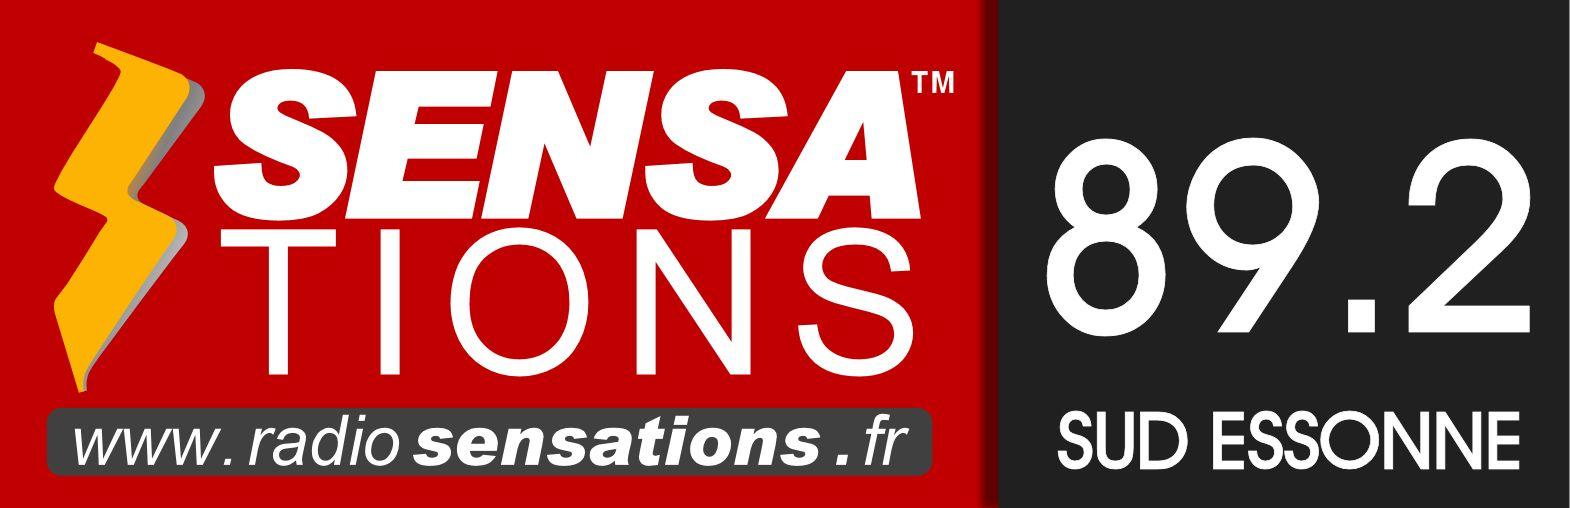 SENSATIONS Logo - Partenariat - 89-2 - 300dpi